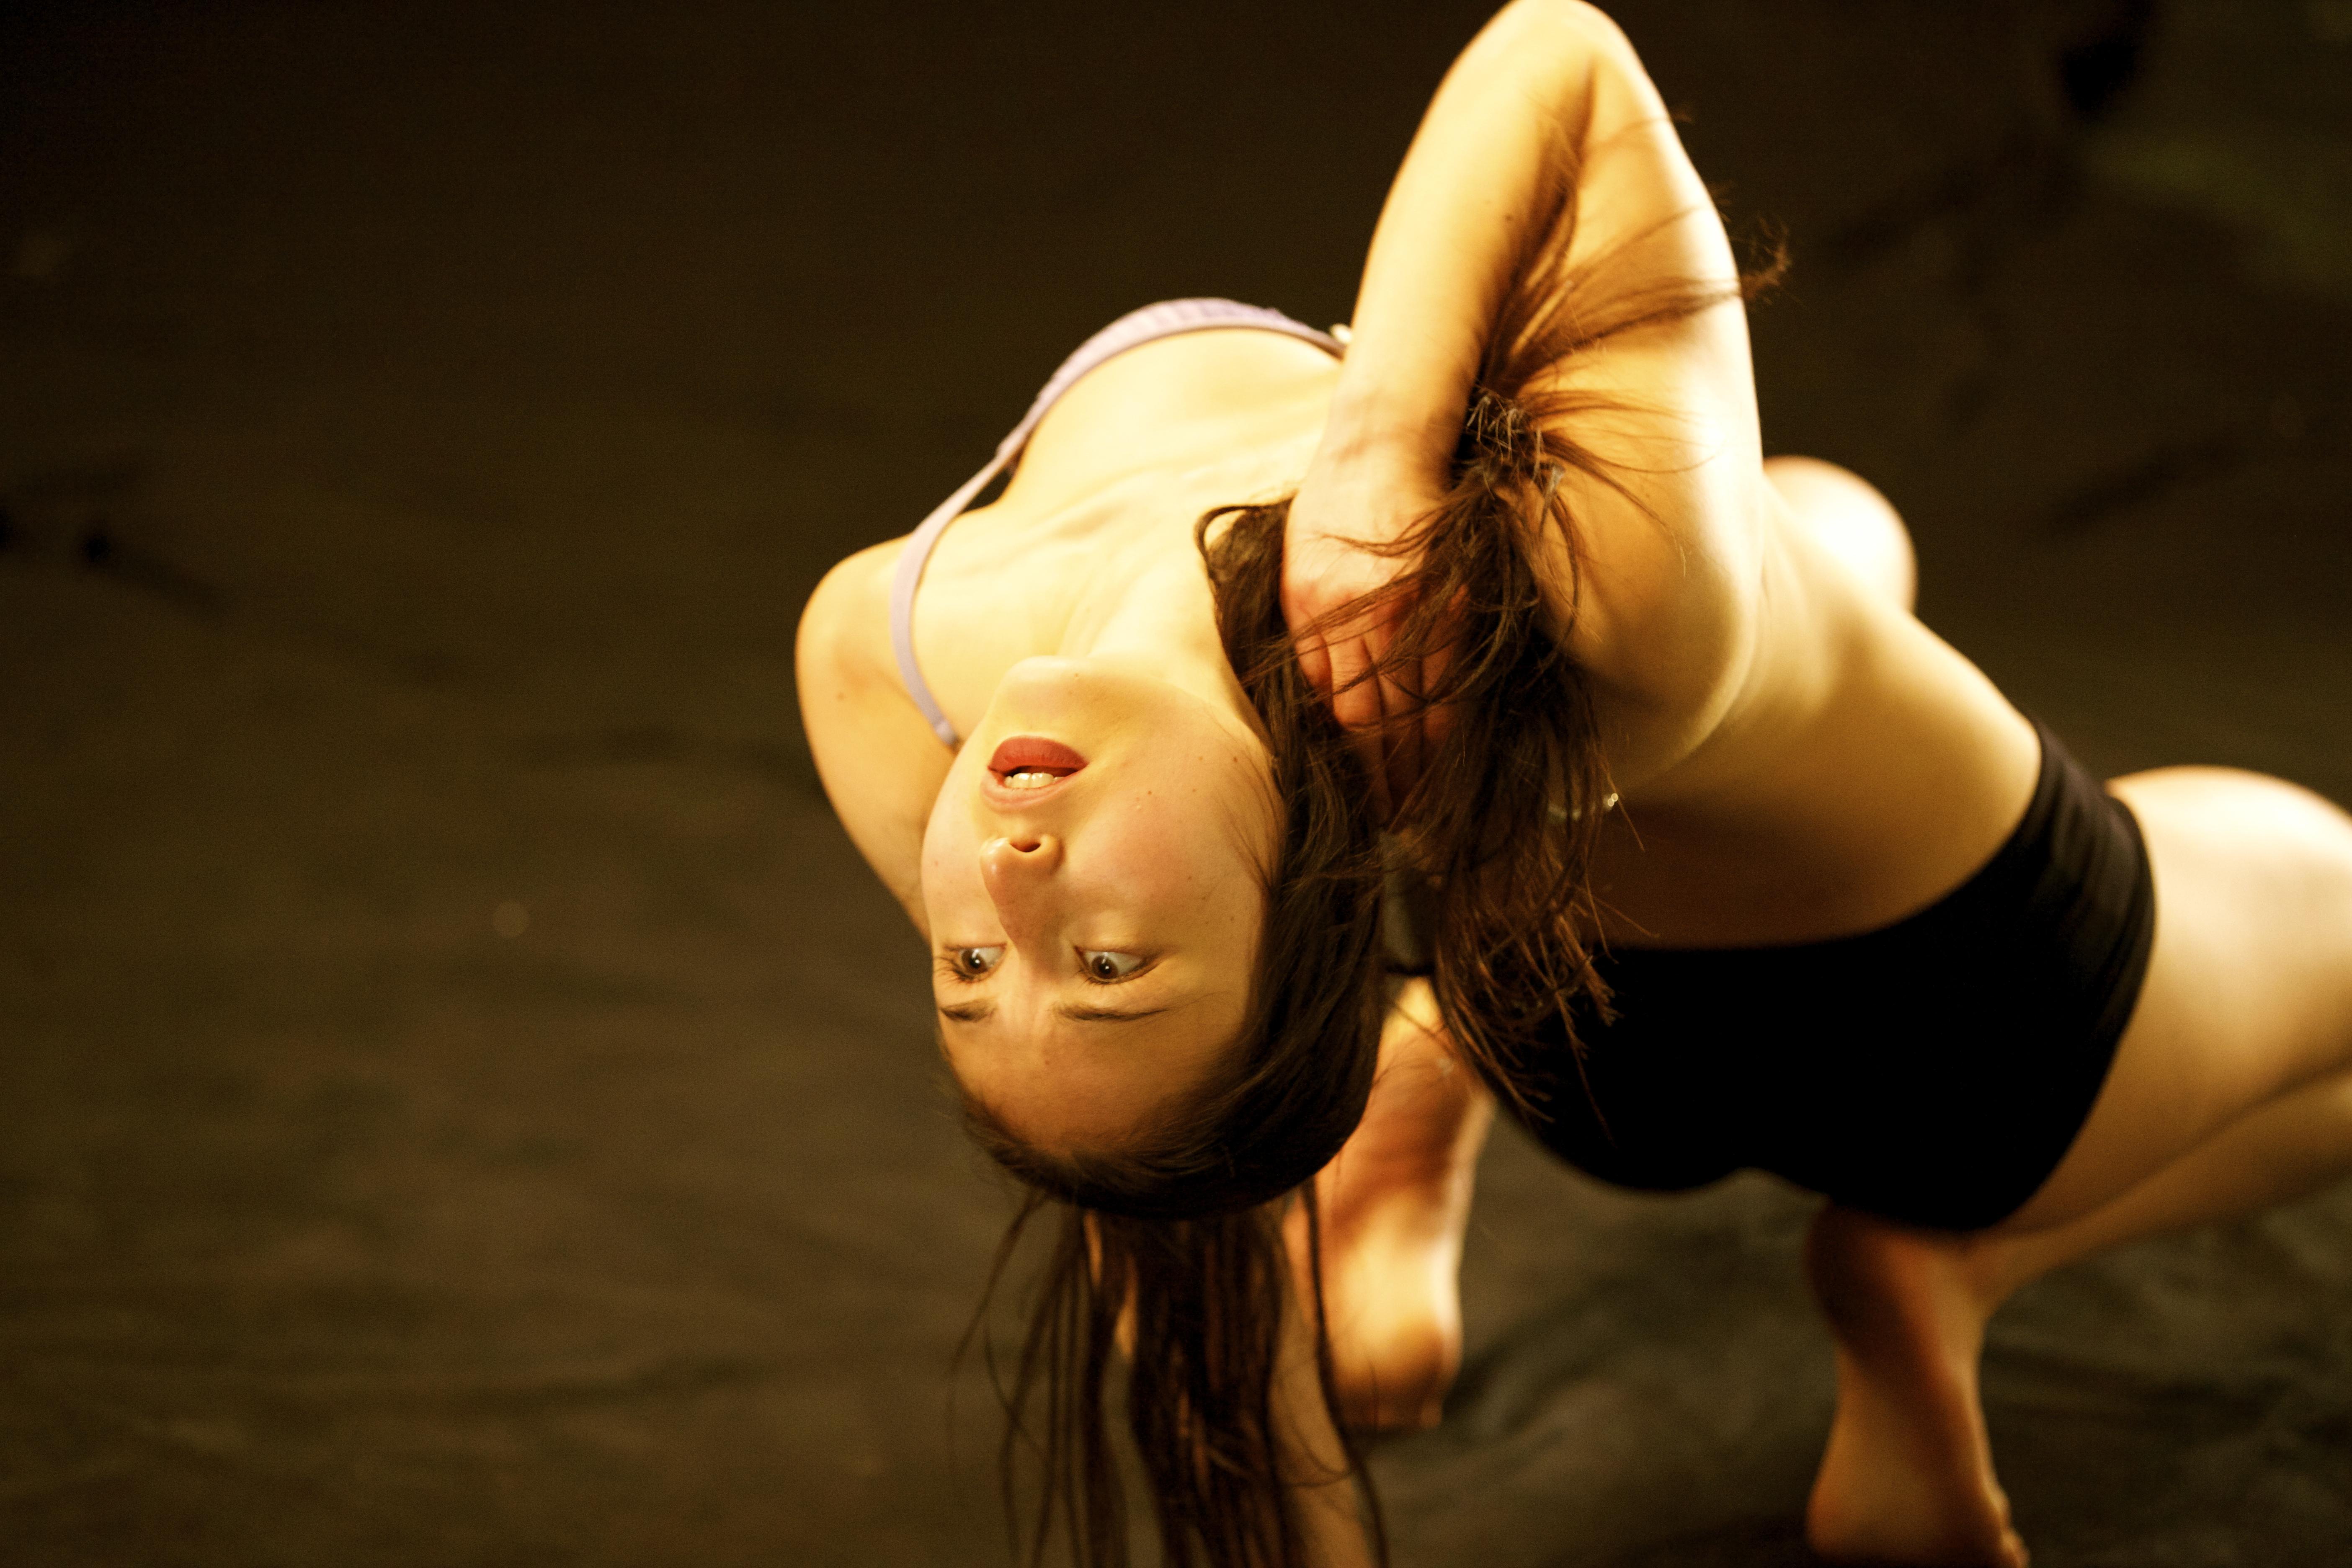 Then Dance Body Image Lizzy 6.jpg